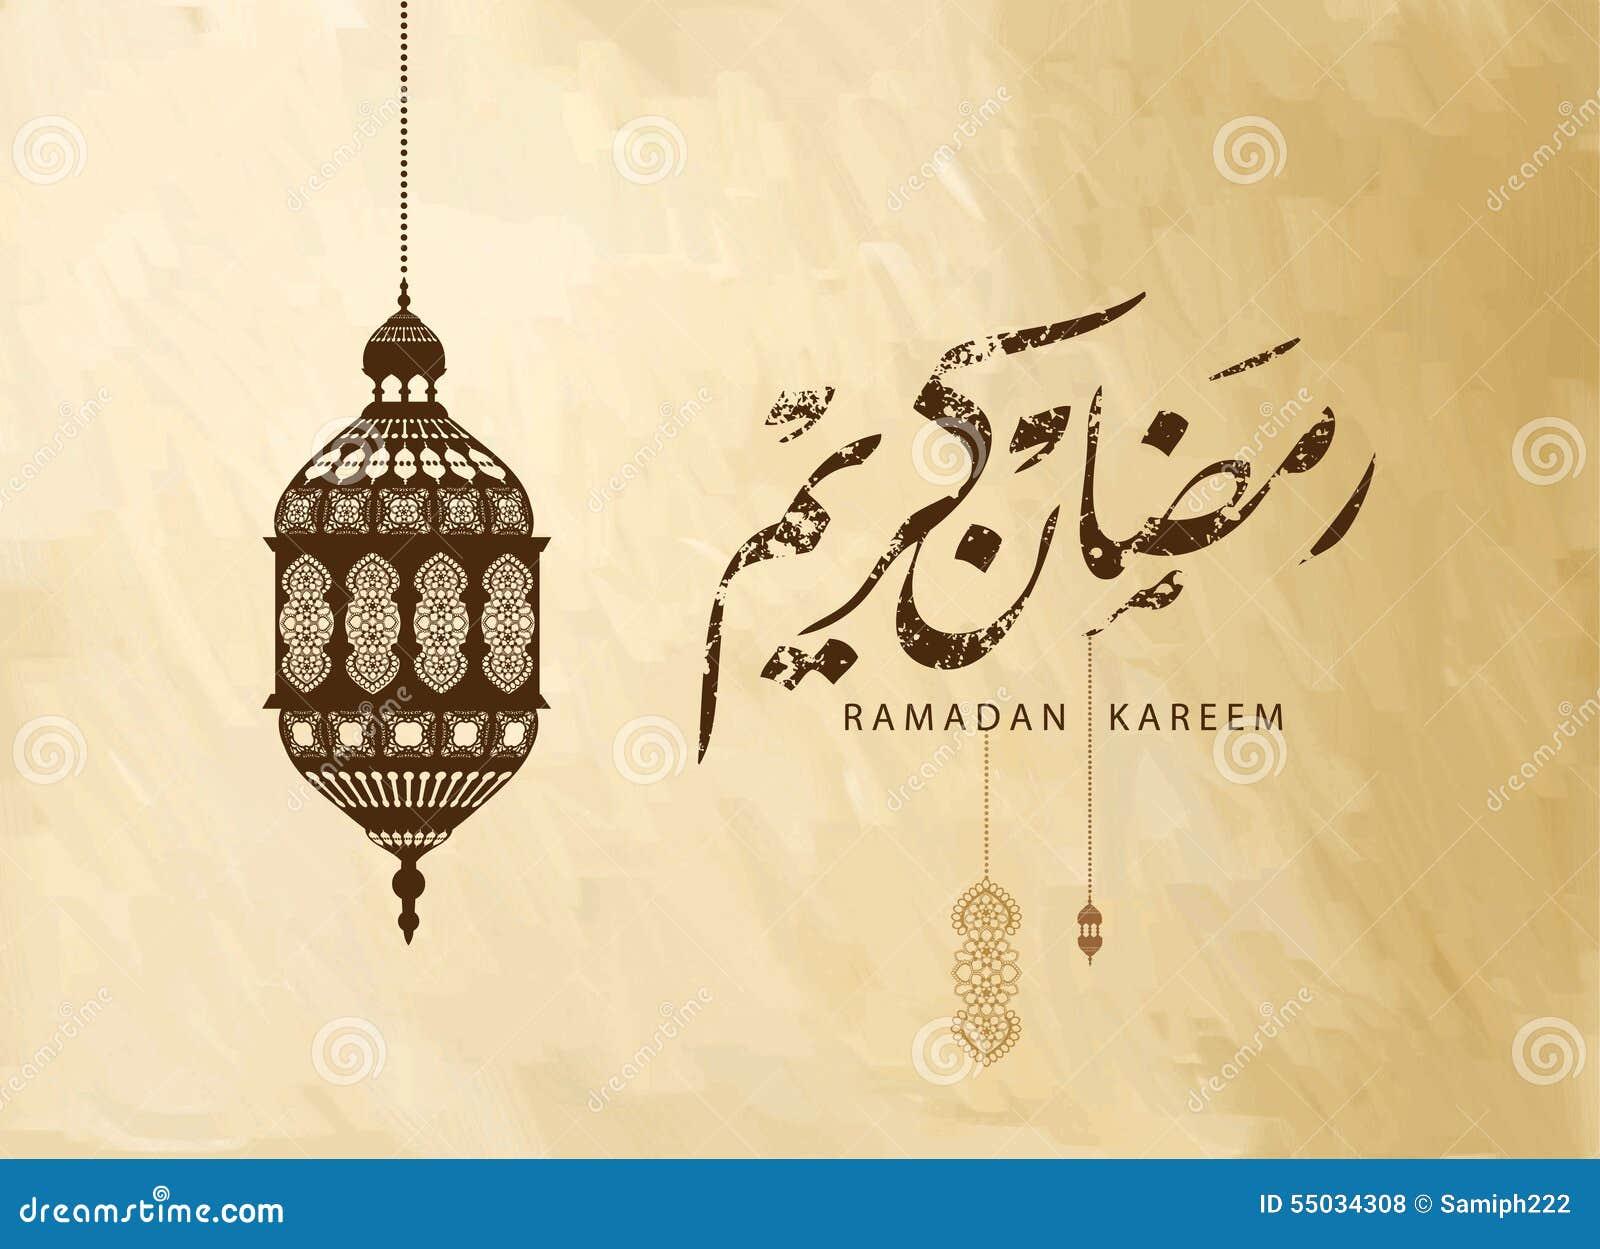 Lantern of ramadan ramadan kareem beautiful greeting card stock traditional arabic lantern for ramadan kareem greeting cards beautiful background with arabic calligraphy which means ramadan kareem for muslim m4hsunfo